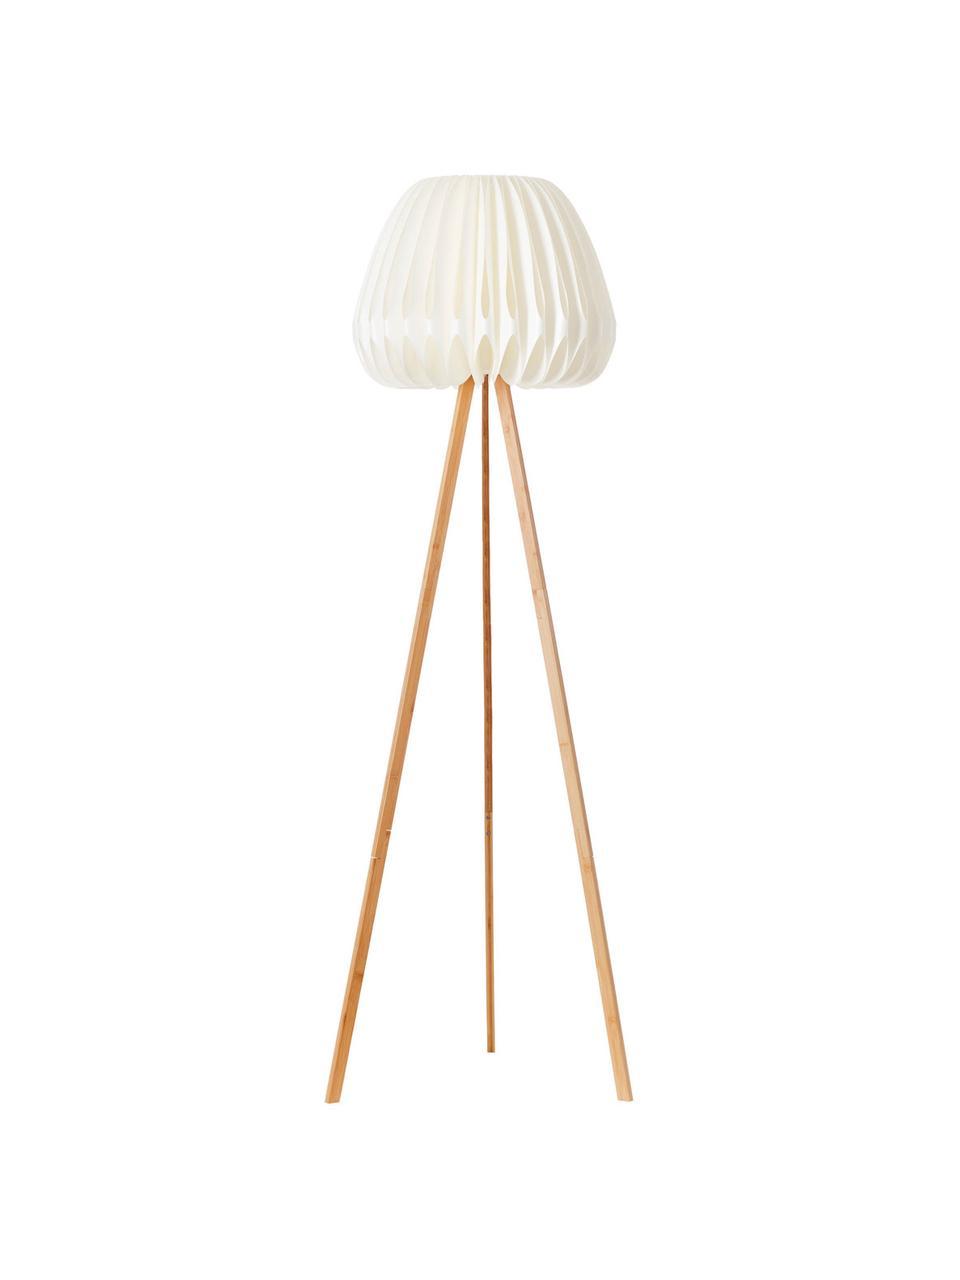 Lampadaire trépied en bambou Inna, Blanc, bambou